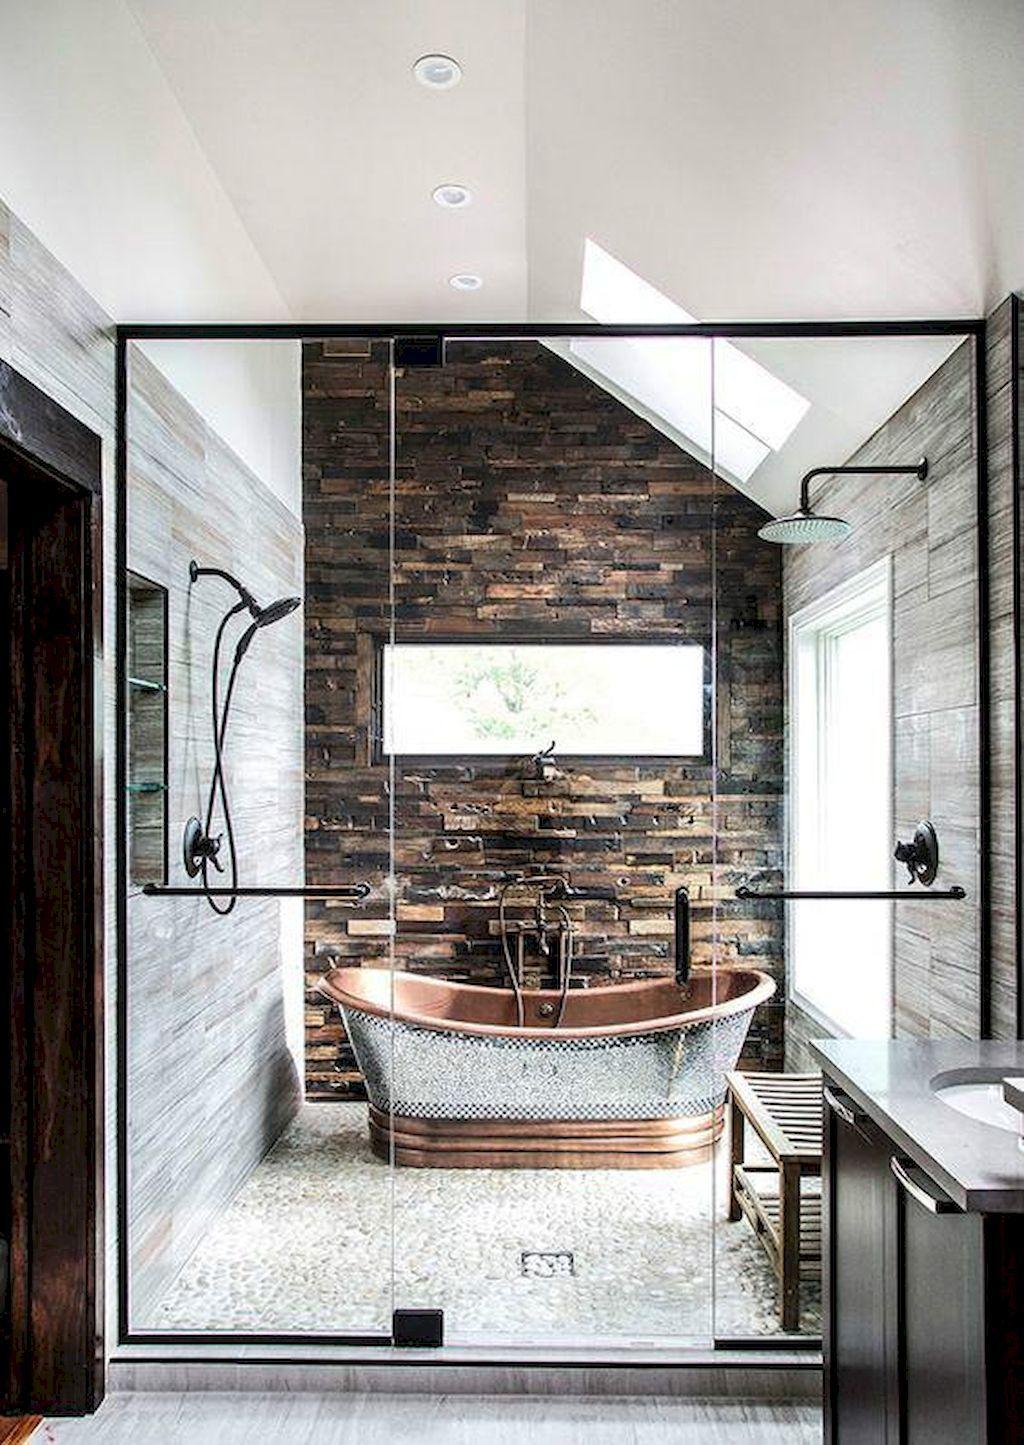 60 stylish farmhouse bathroom with brick wall decor ideas